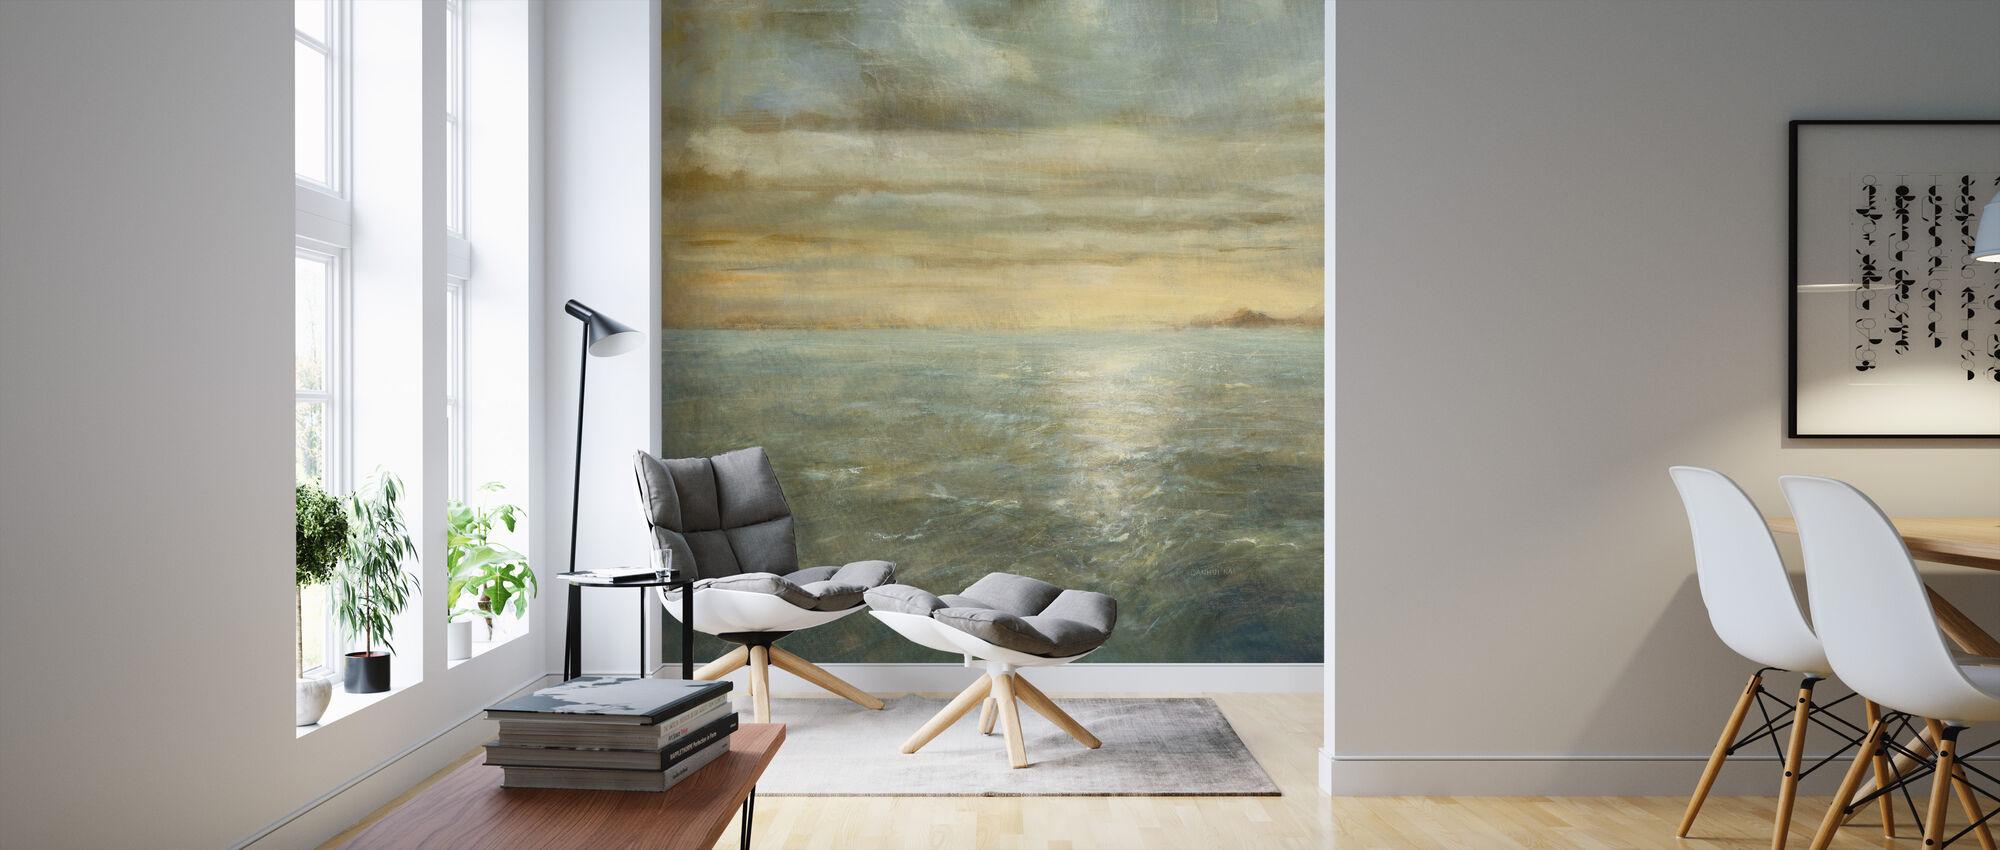 Serene Sea - Wallpaper - Living Room